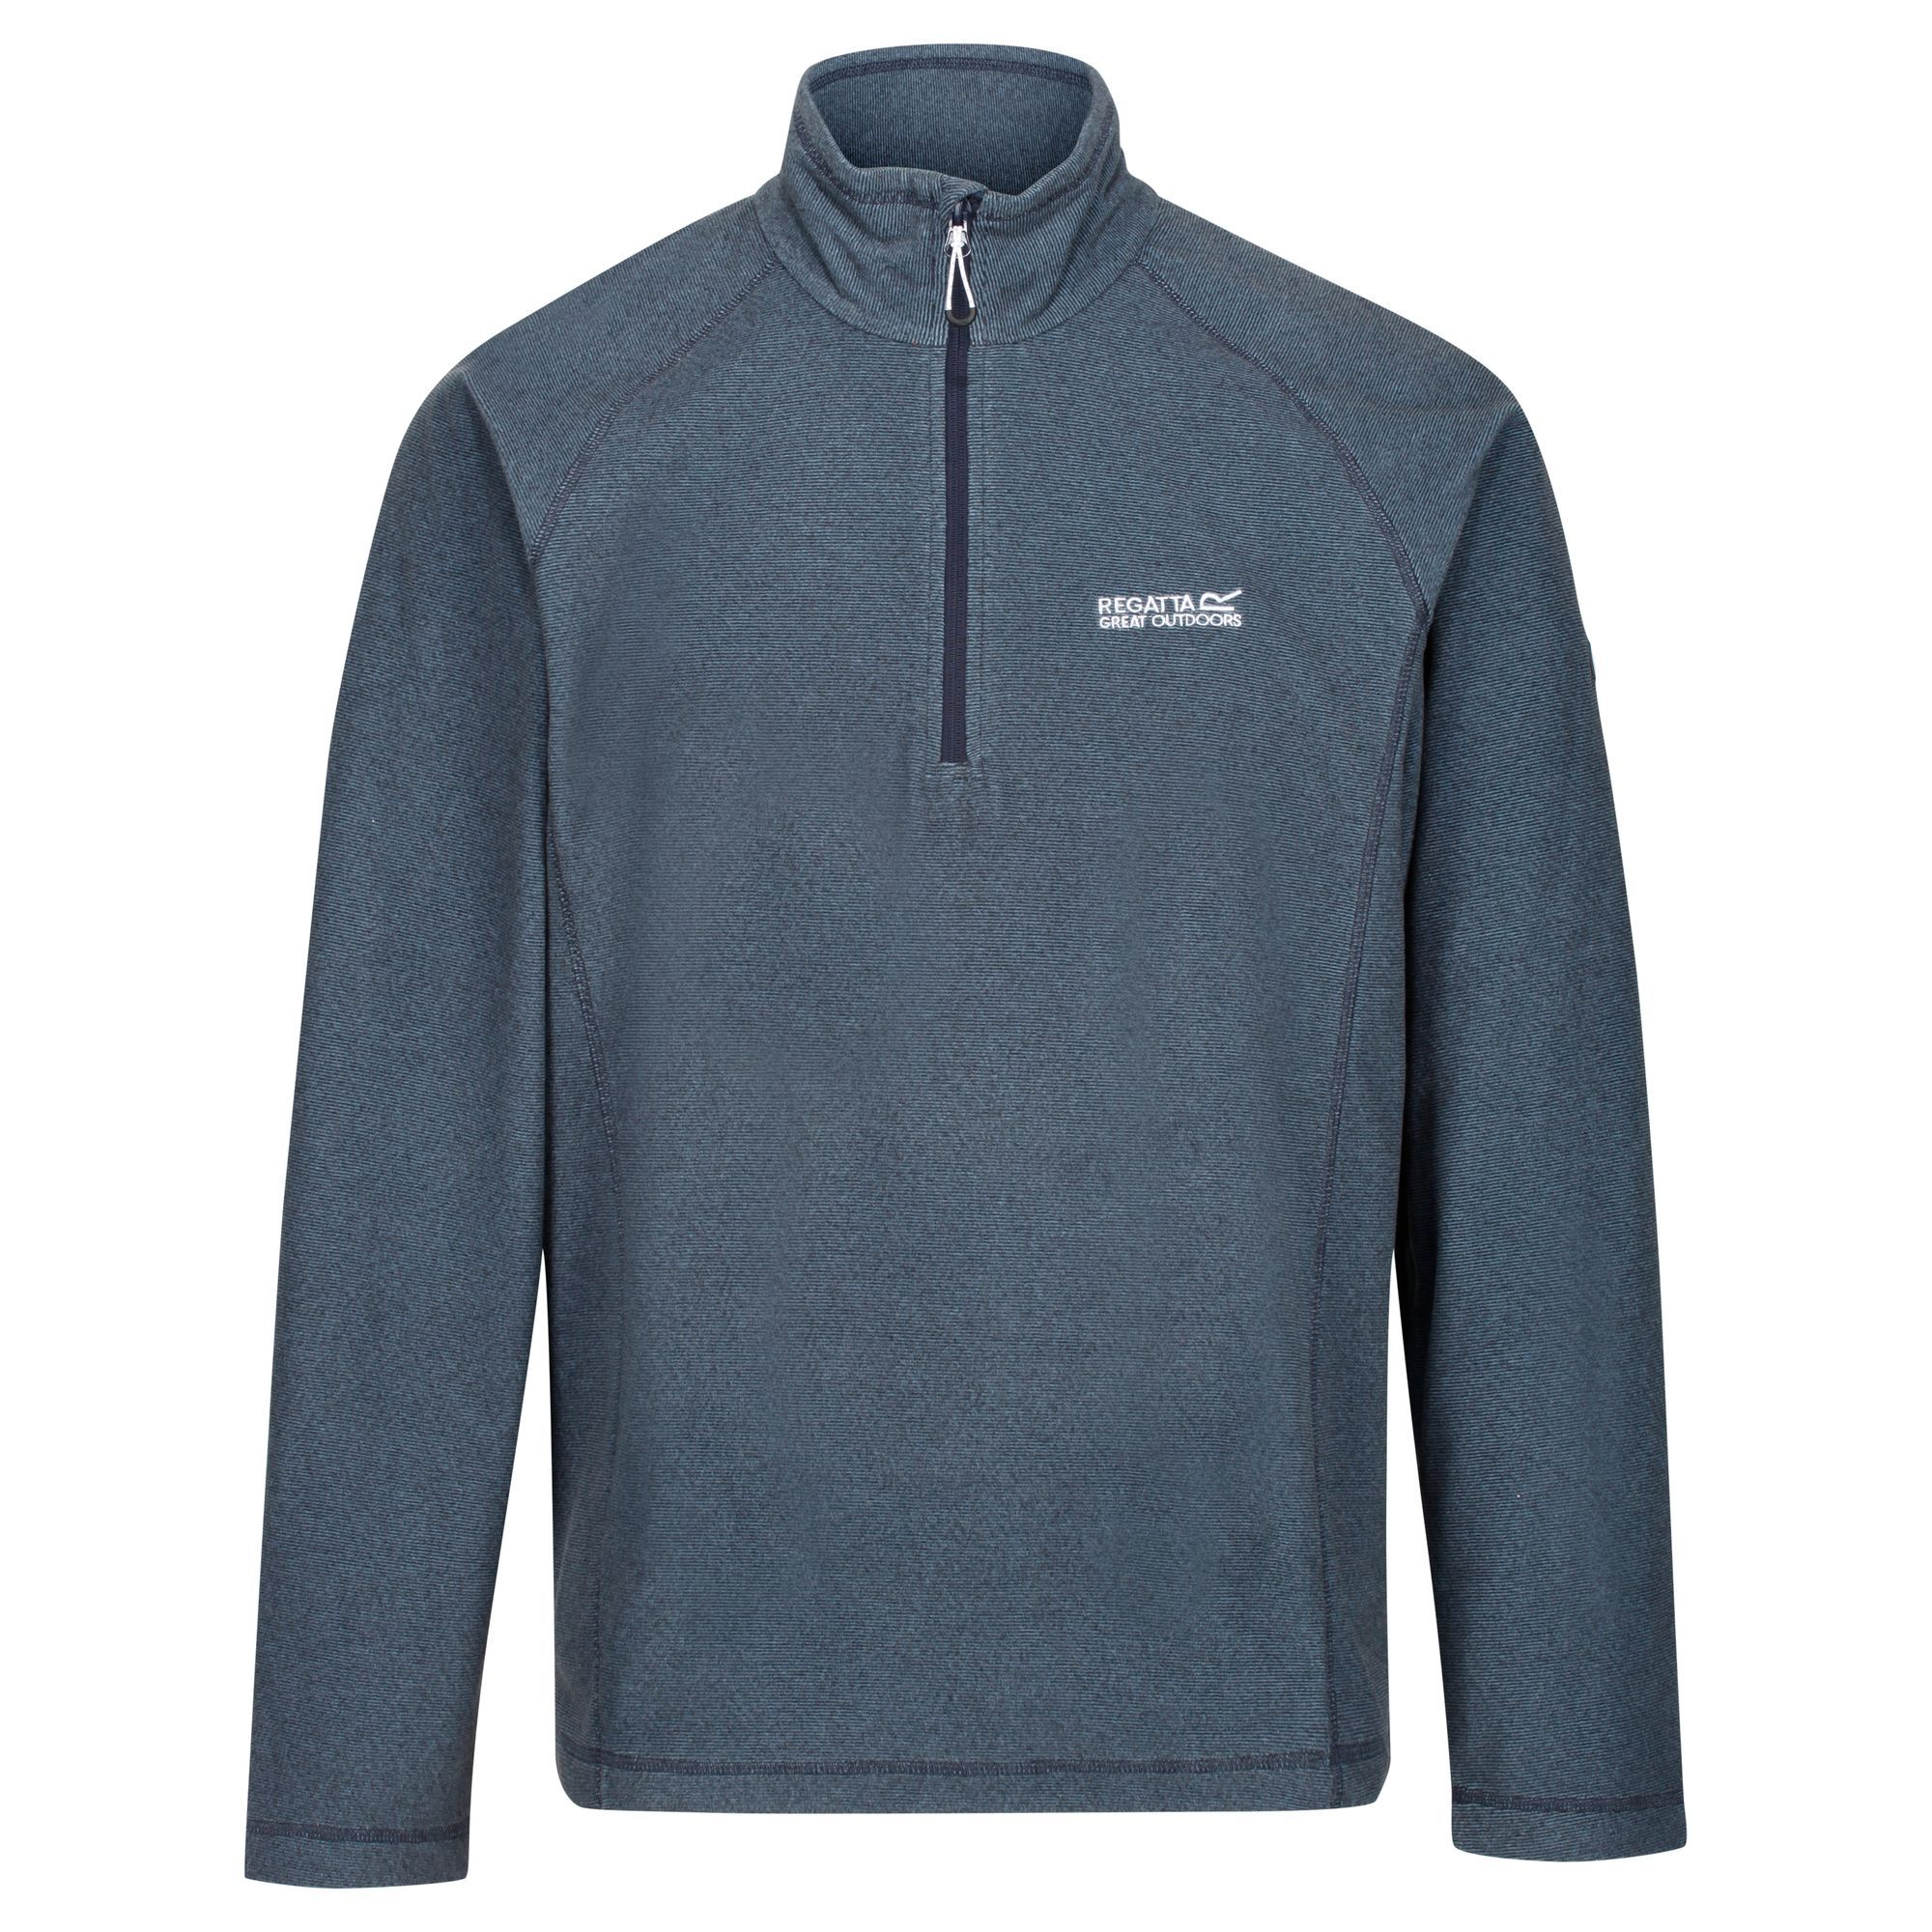 Regatta-Mens-Fleece-Jacket-Massive-Clearance-RRP-60-00 thumbnail 6